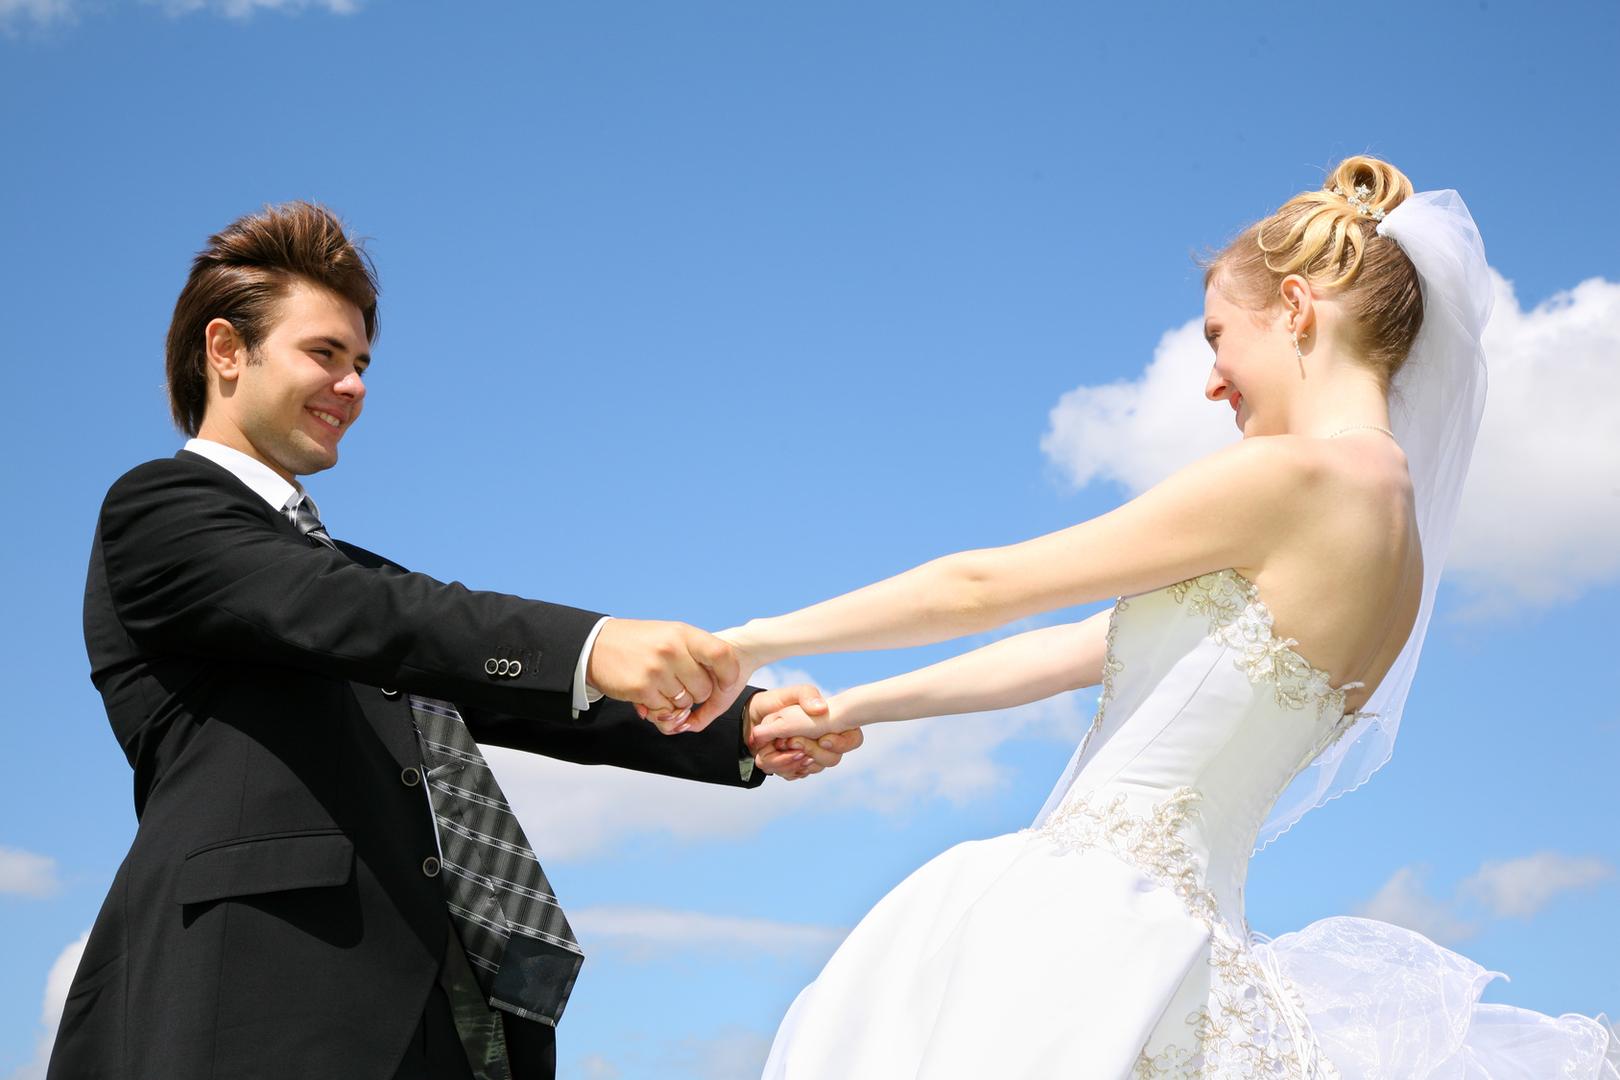 Charlotte Wedding Limosines